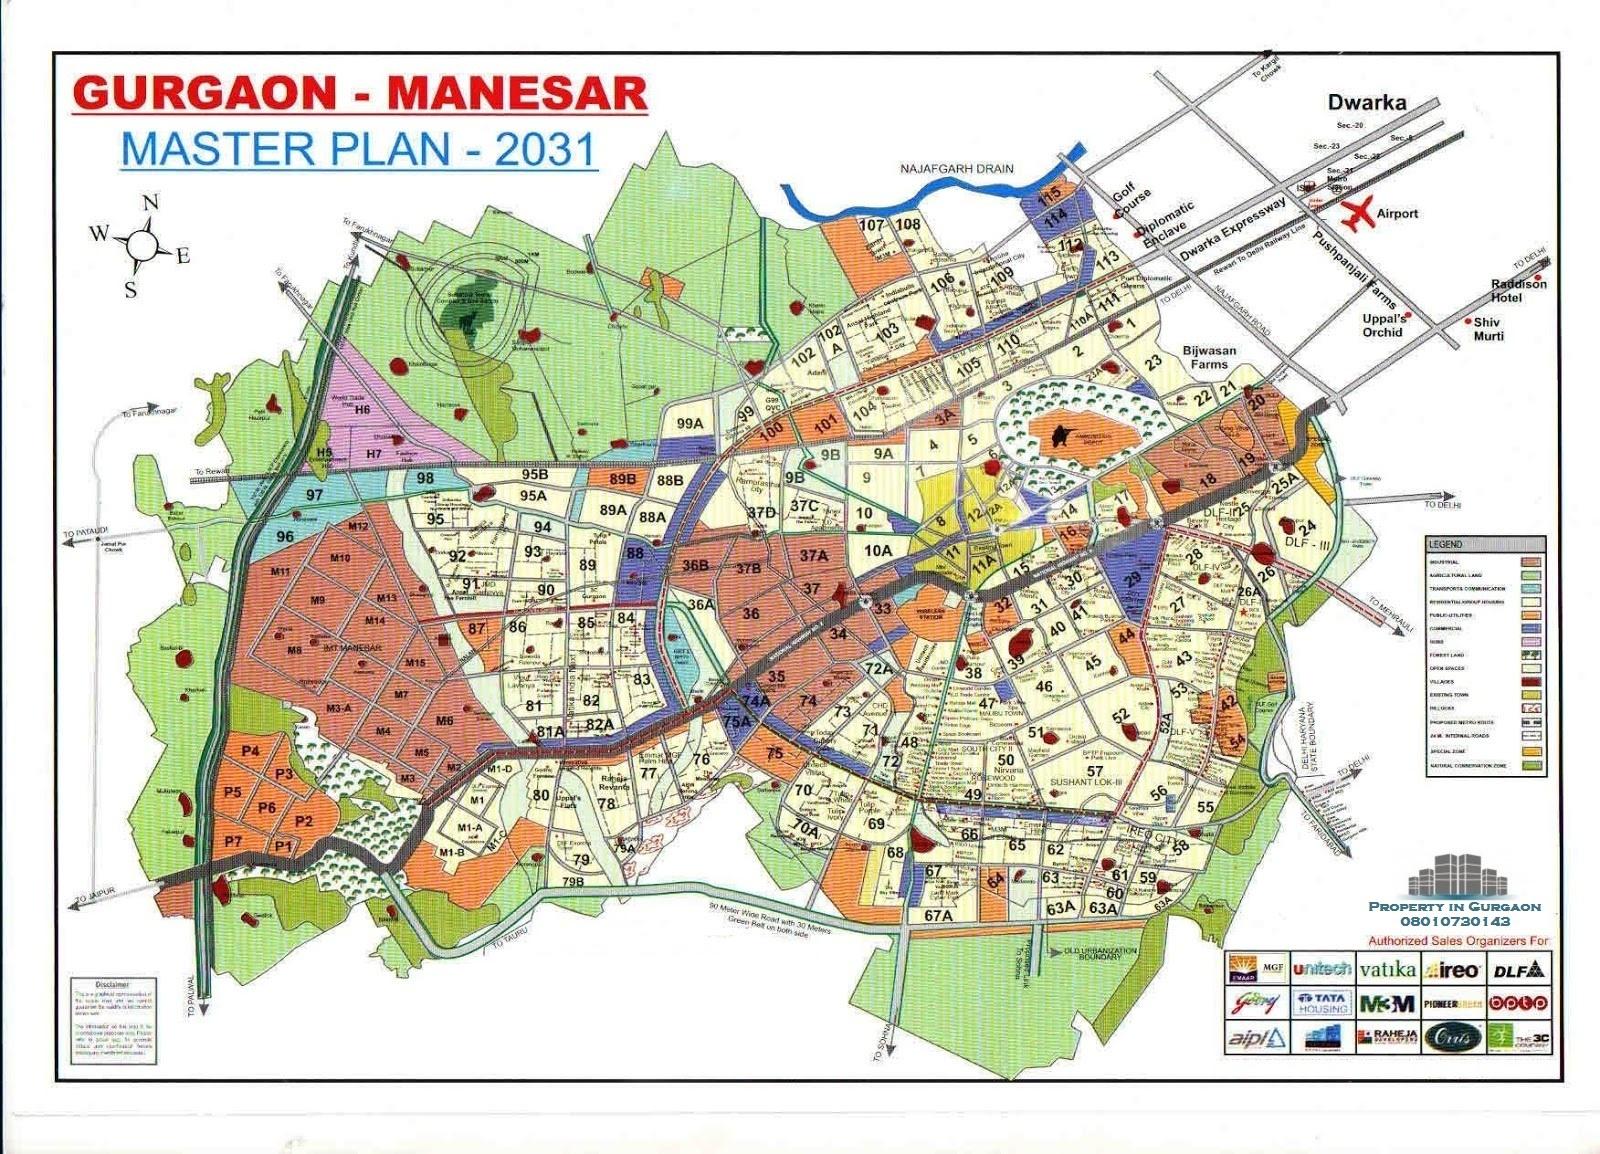 Gurgaon Sector Maps |Gurgaon Map| Huda Sector Plan | Gurgaon Master plan 2031 | Gurgaon Sector Plan 2031 | Gurgaon Property Map | Gurugram Map | Gurugram Master Plan 2031